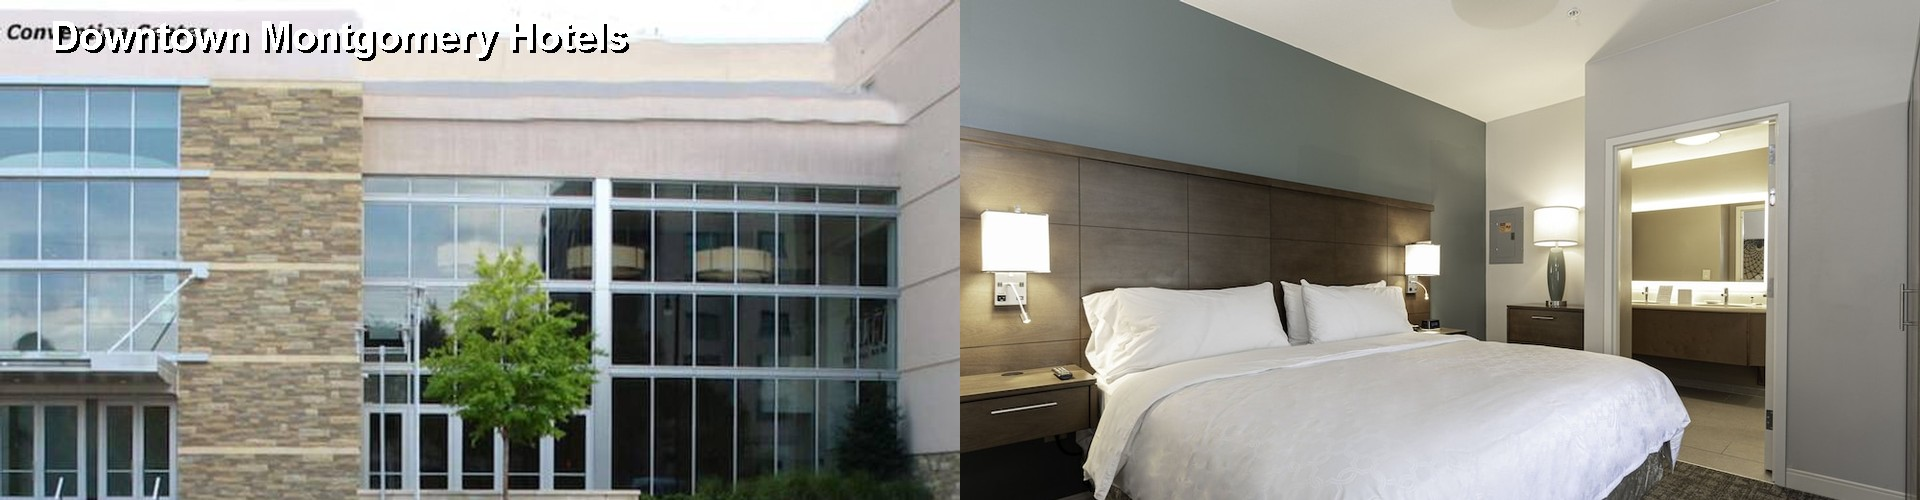 5 Best Hotels Near Downtown Montgomery